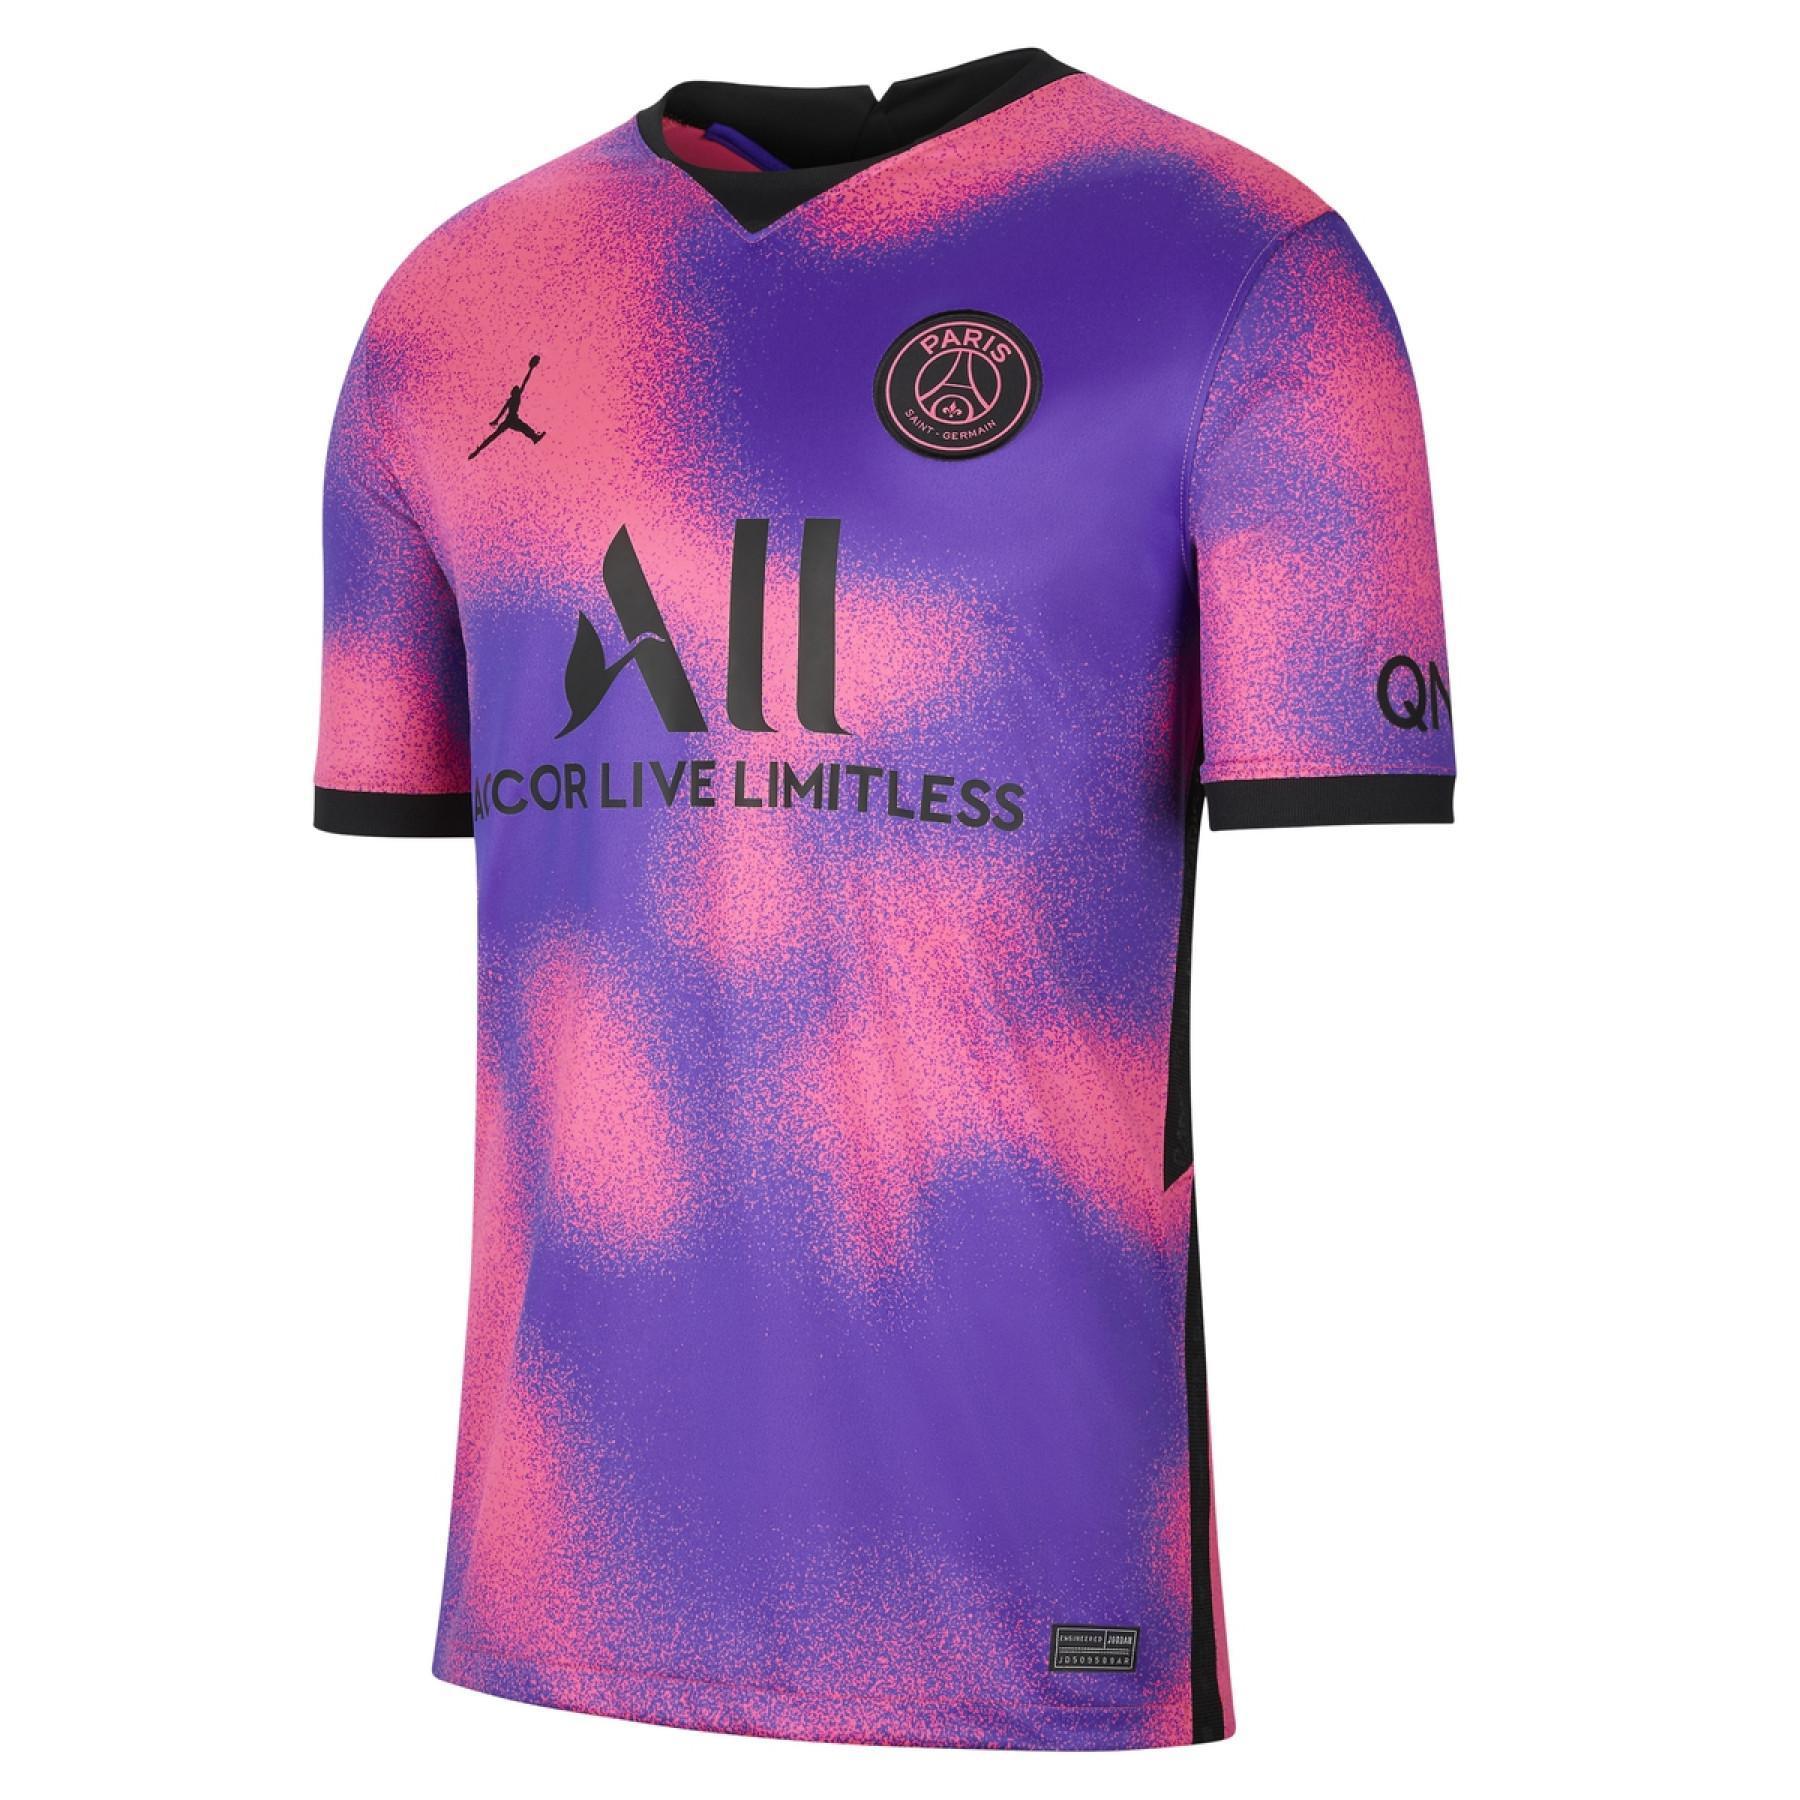 Fourth PSG 2020/21 jersey